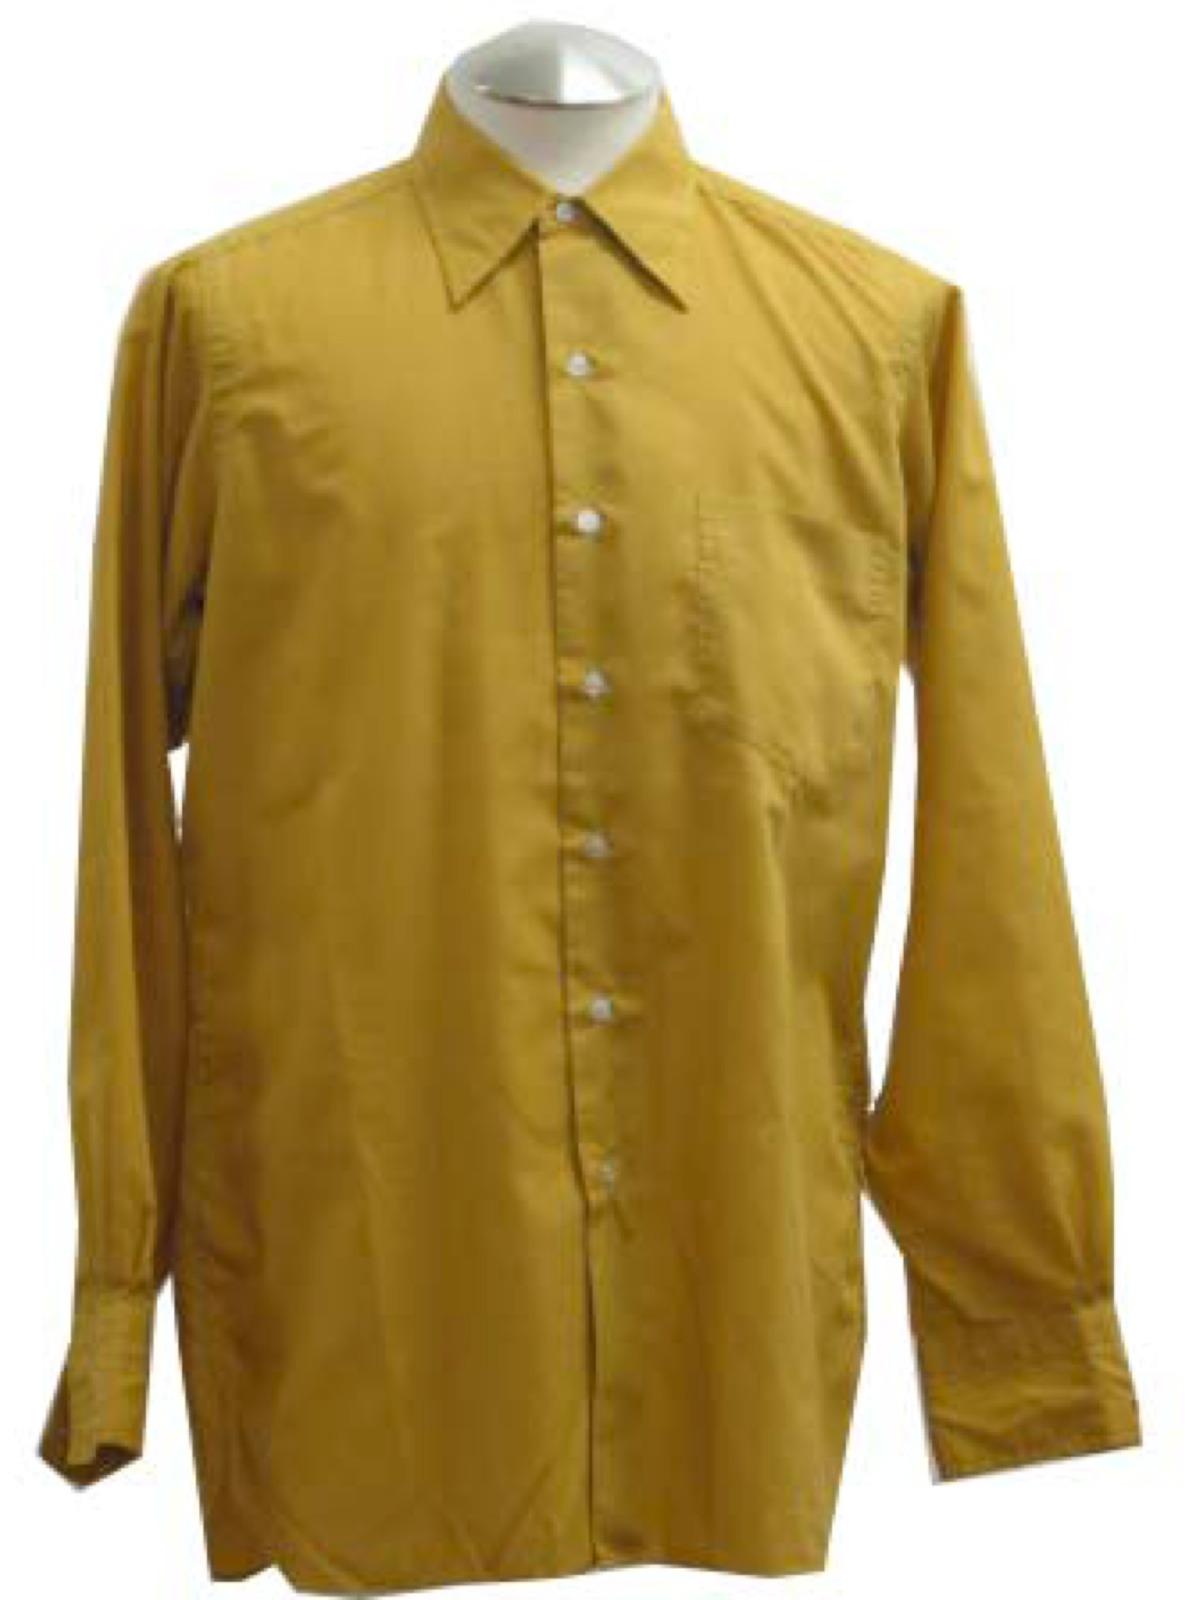 70s Treskes Shirt 70s Treskes Mens Gold Polyester Cotton